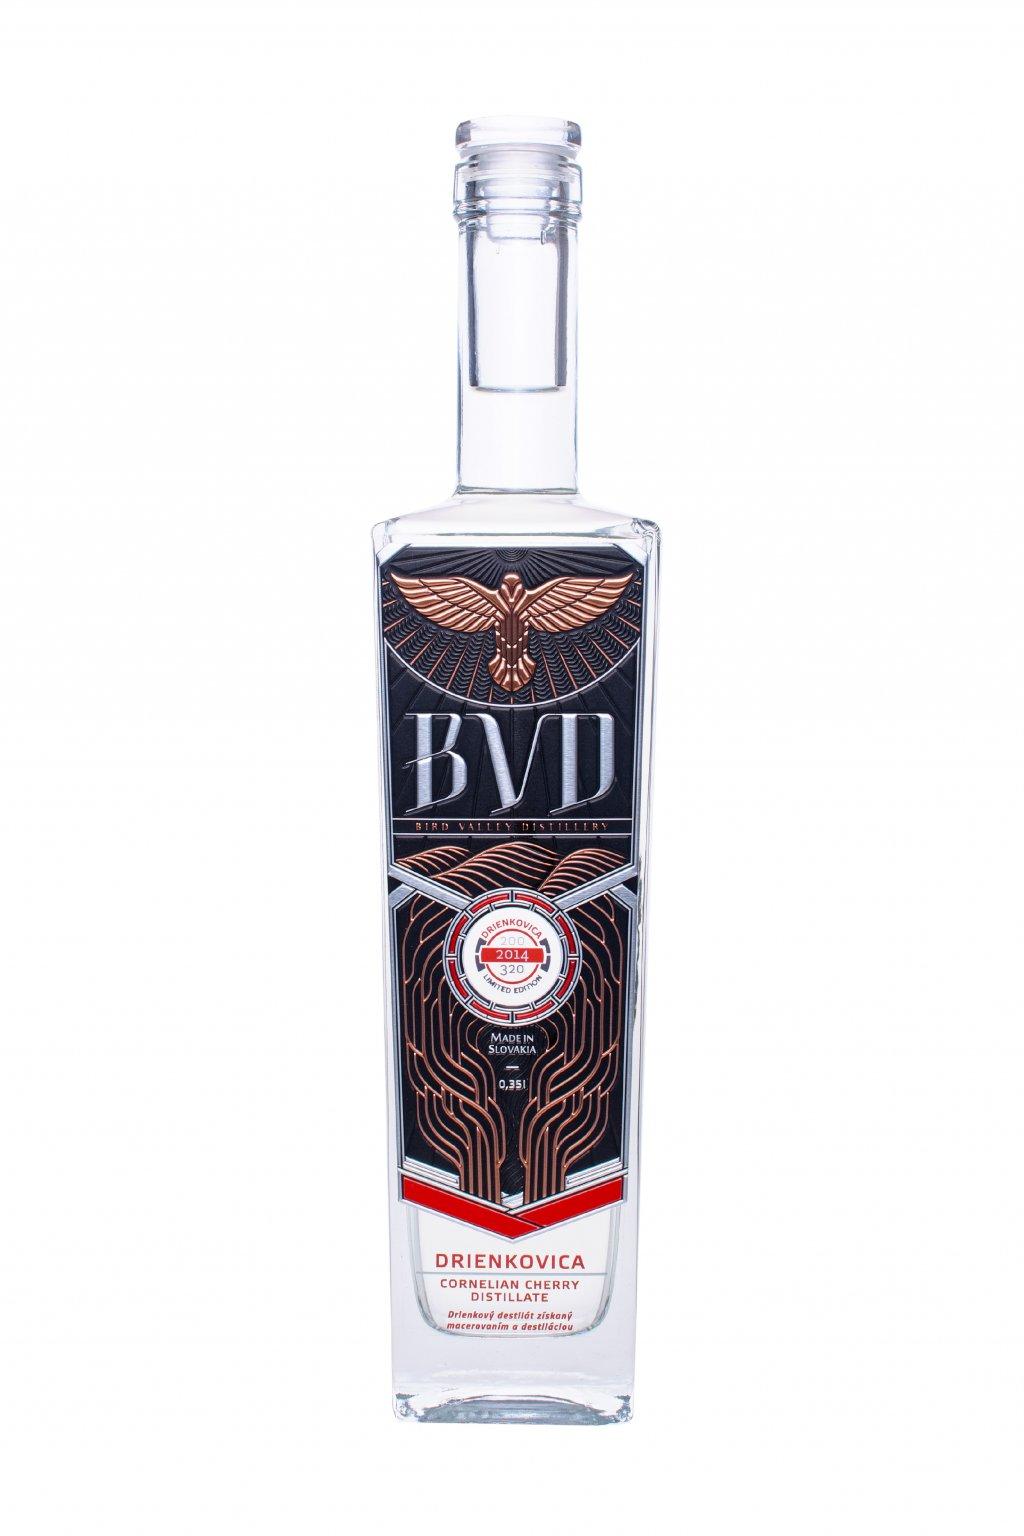 BVD Drienkovica destilat 0,35l